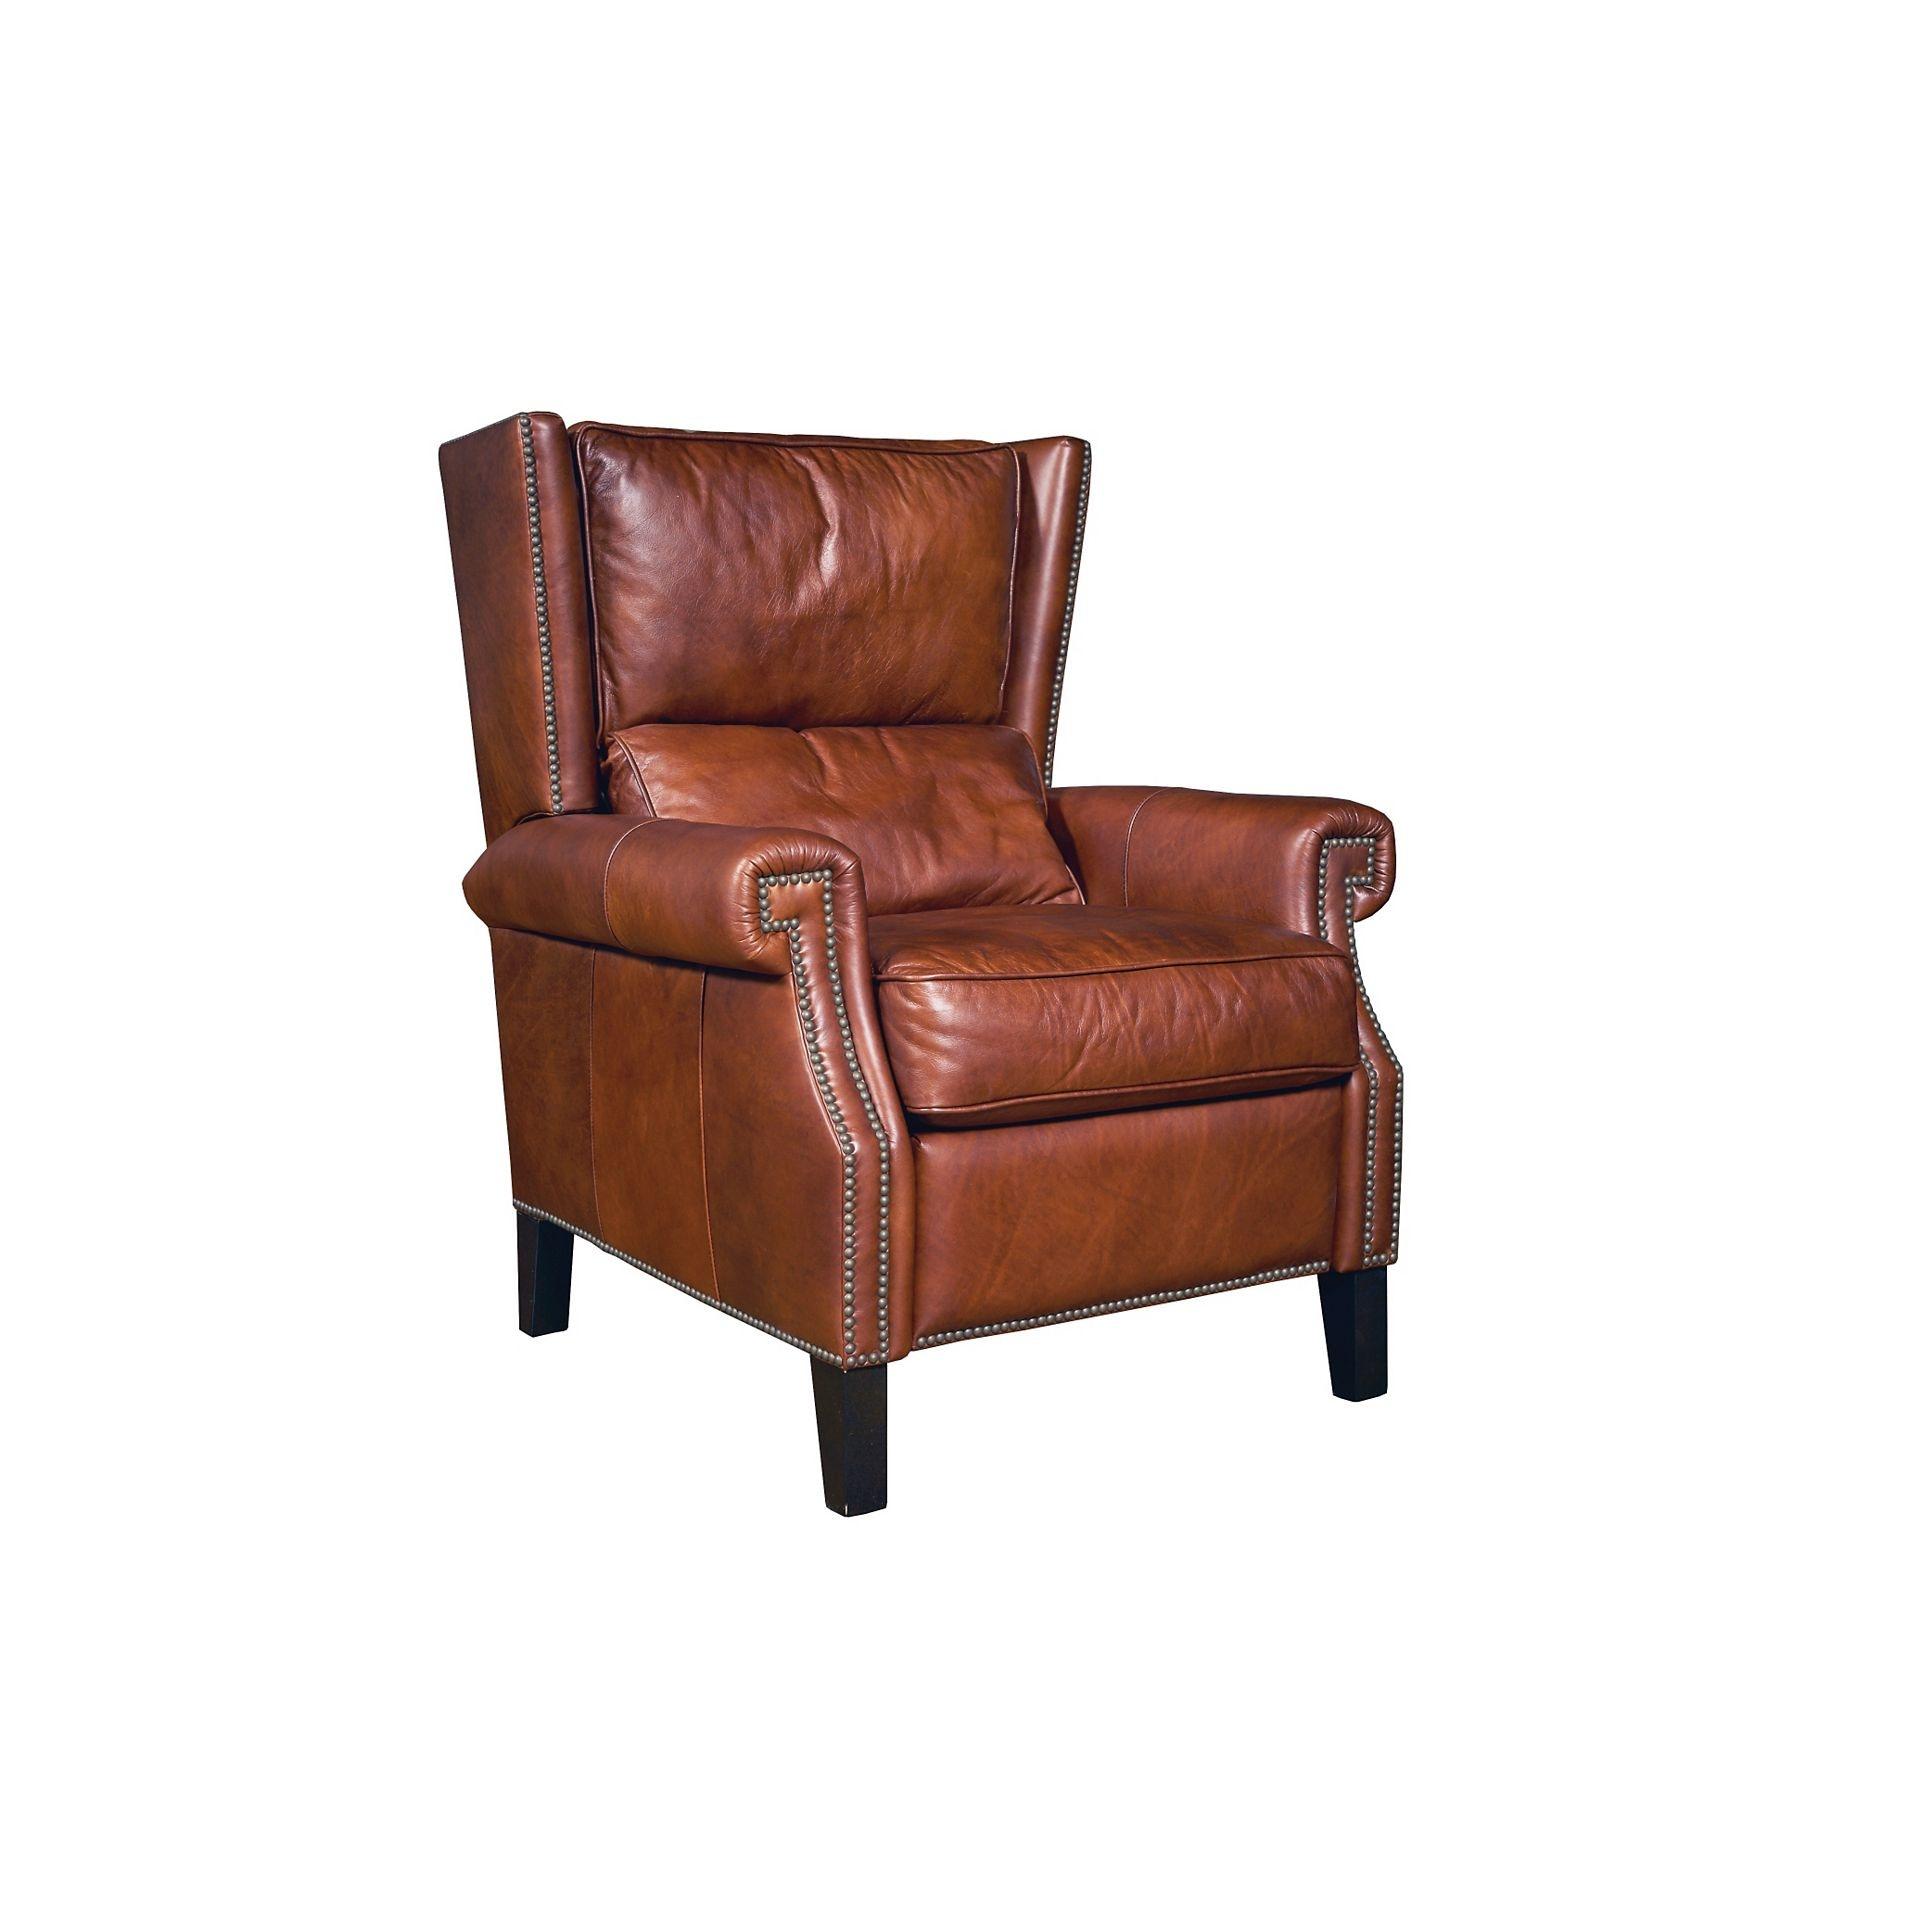 Henredon Leather Sofa Henredon Leather Sofa Mathis